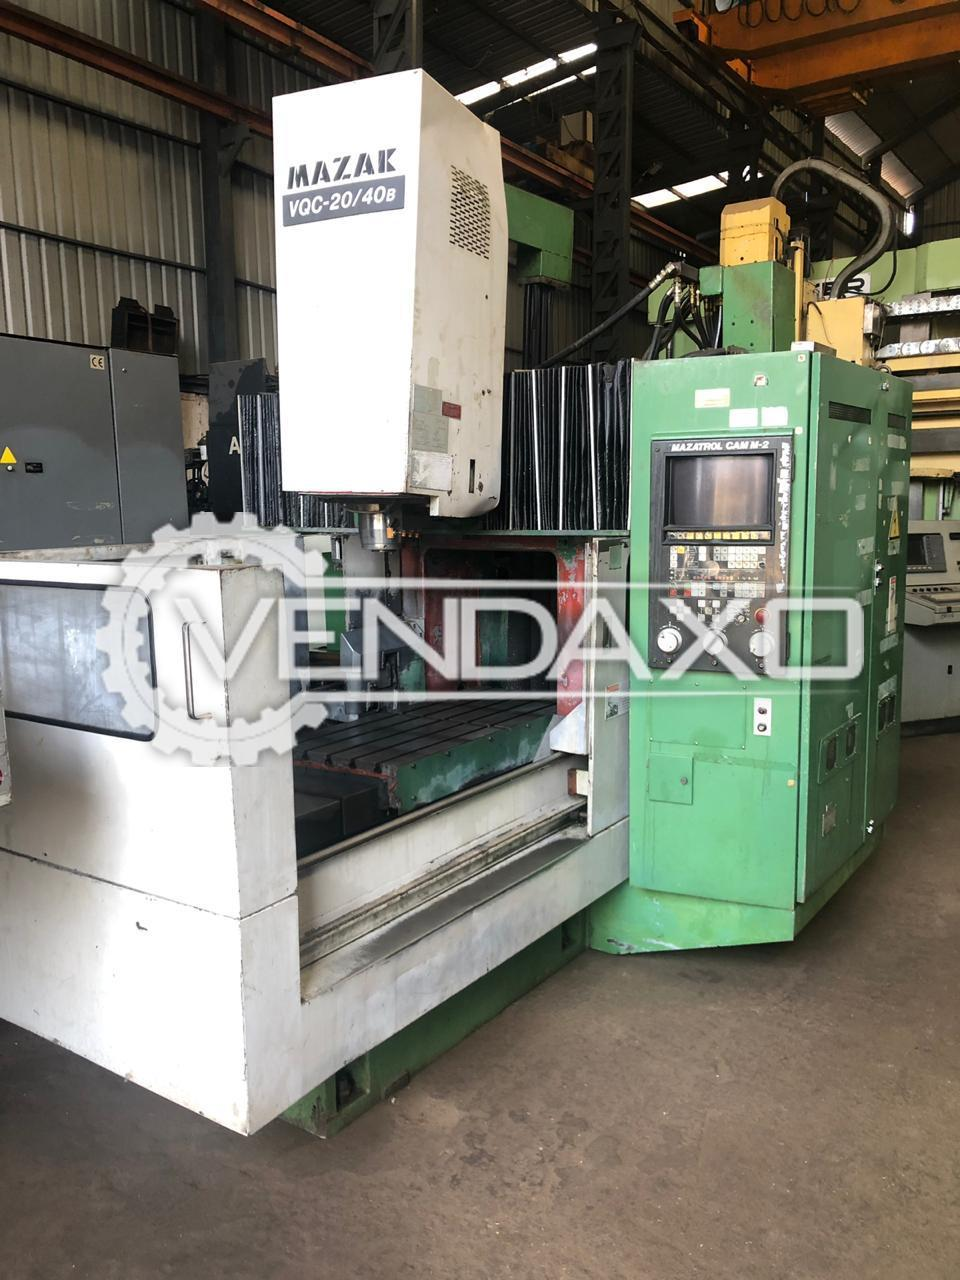 Mazak VQC-20/40B Double Column CNC Vertical Machining Center VMC - 1200 x 600 mm